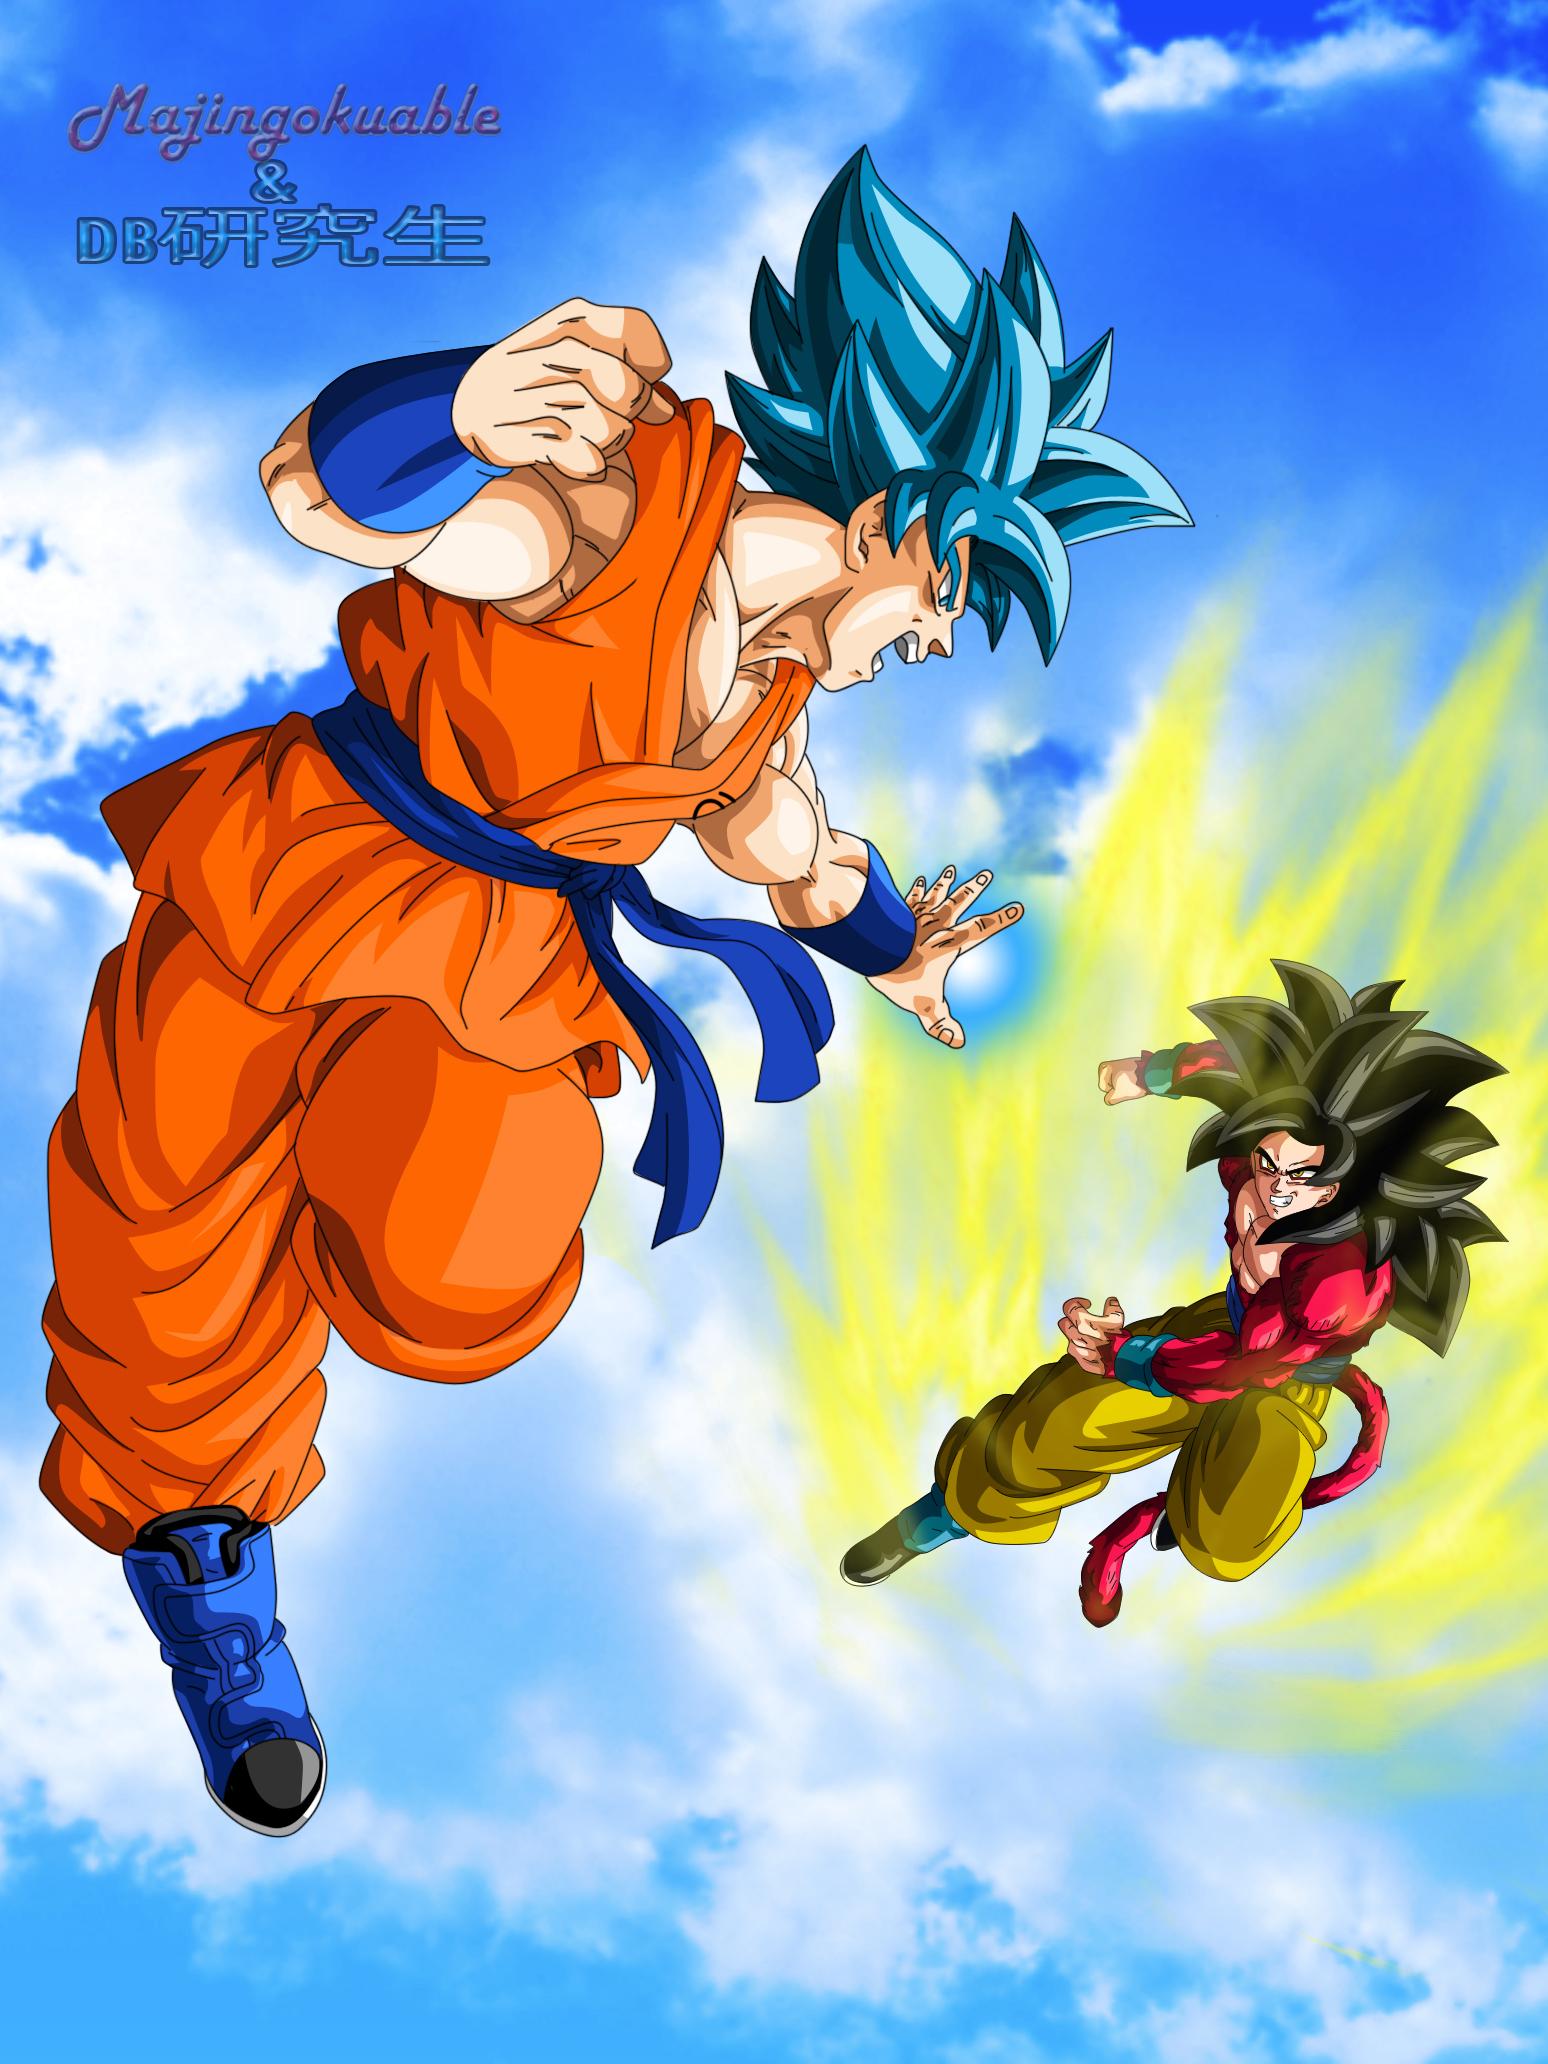 Goku SSGSS vs Goku SSJ4 by Majingokuable on DeviantArt